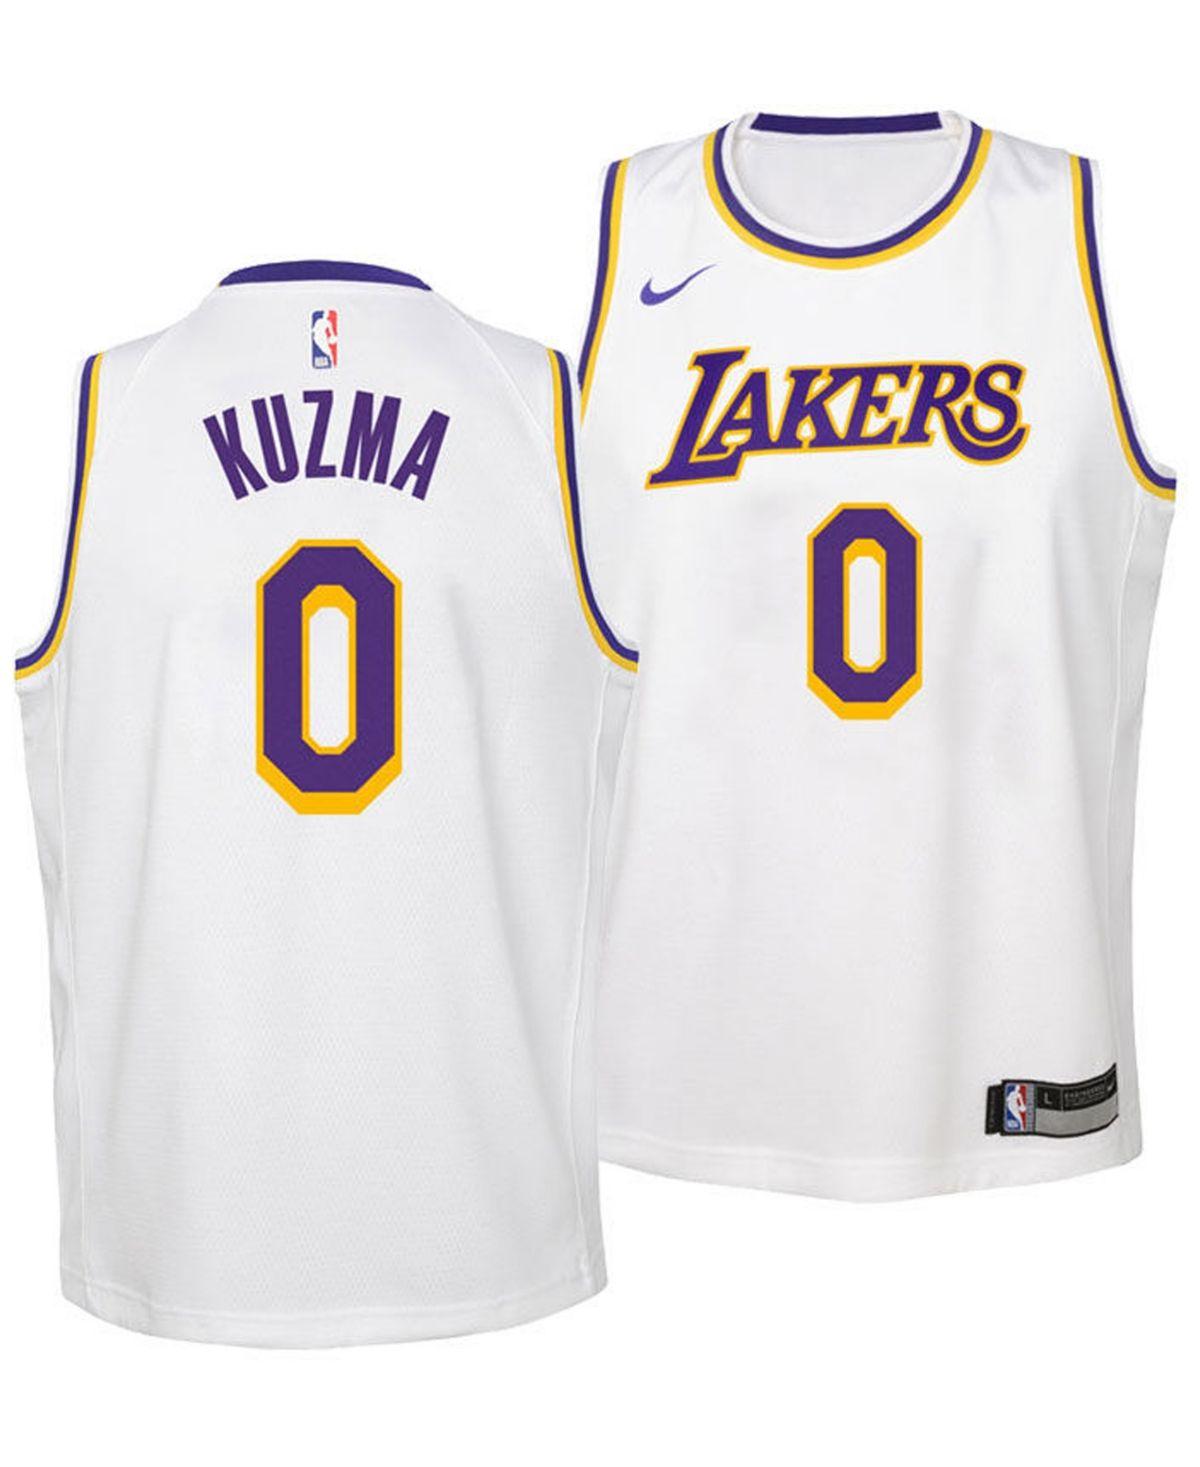 Nike Kyle Kuzma Los Angeles Lakers Association Swingman Jersey Big Boys 8 20 Reviews All Kids Sports Fan Shop Macy S Los Angeles Lakers Kyle Kuzma Jersey